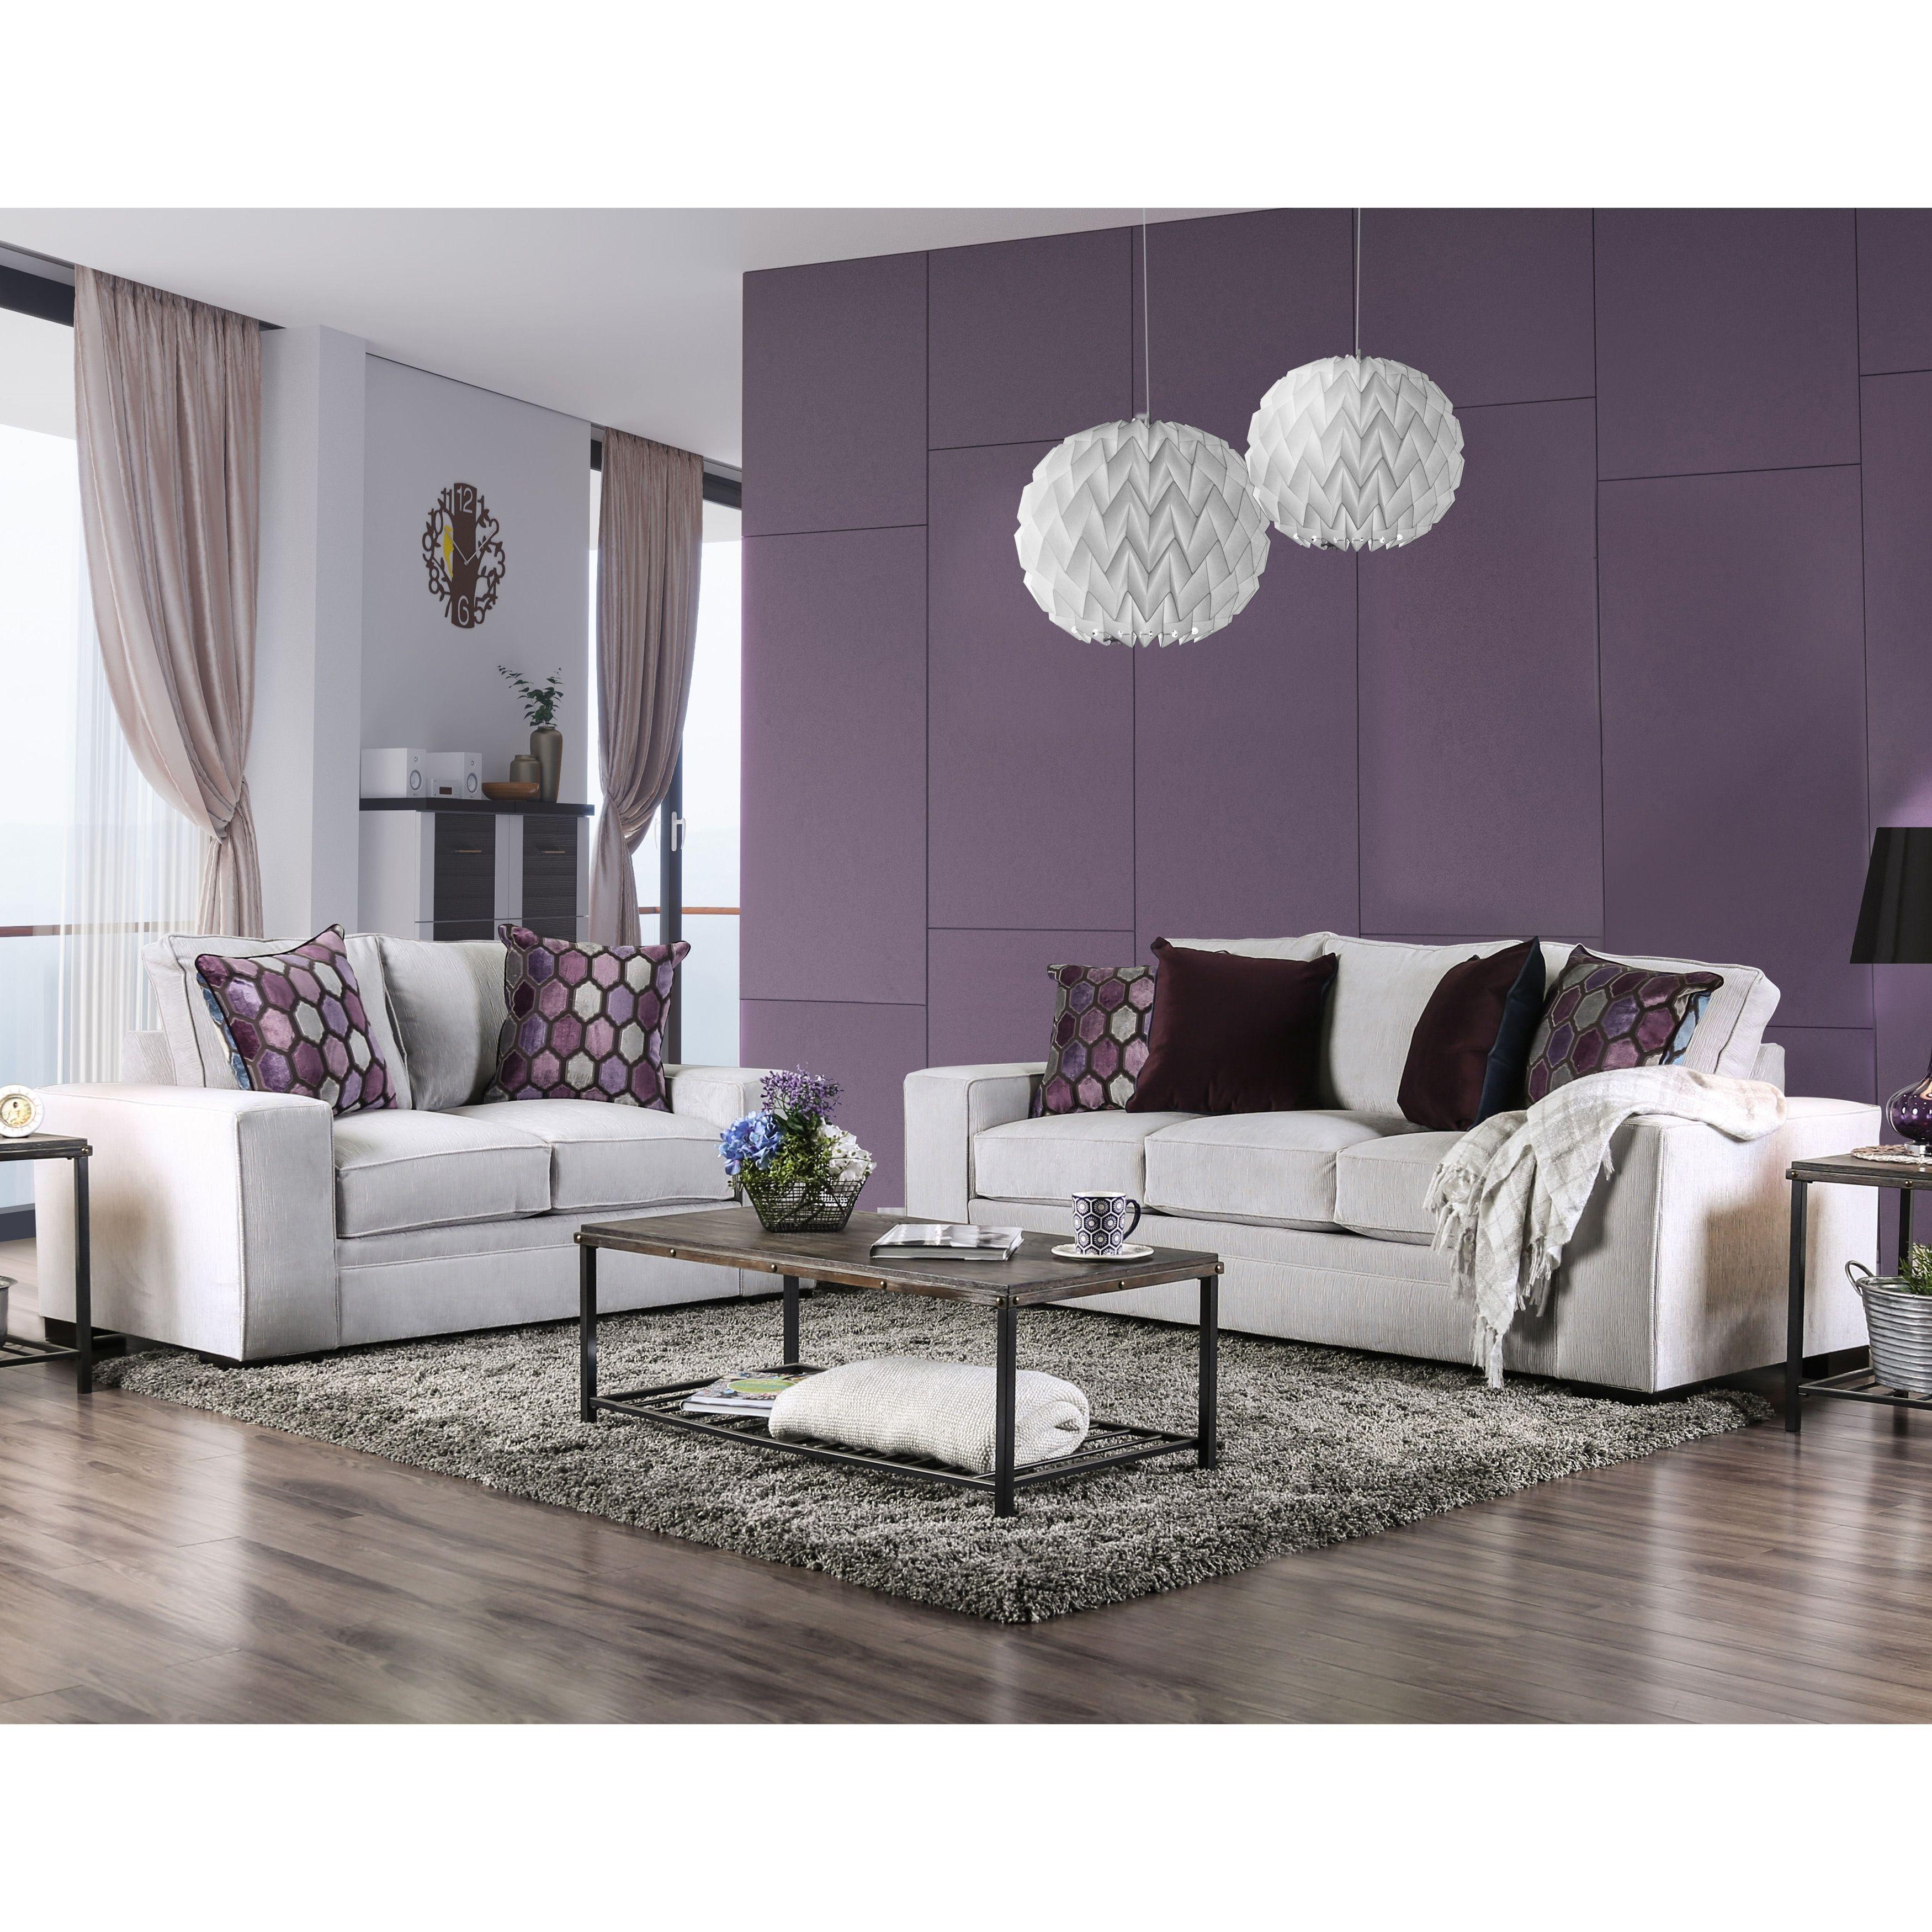 Fabulous Furniture Of America Lenael Contemporary 2 Piece Light Grey Alphanode Cool Chair Designs And Ideas Alphanodeonline